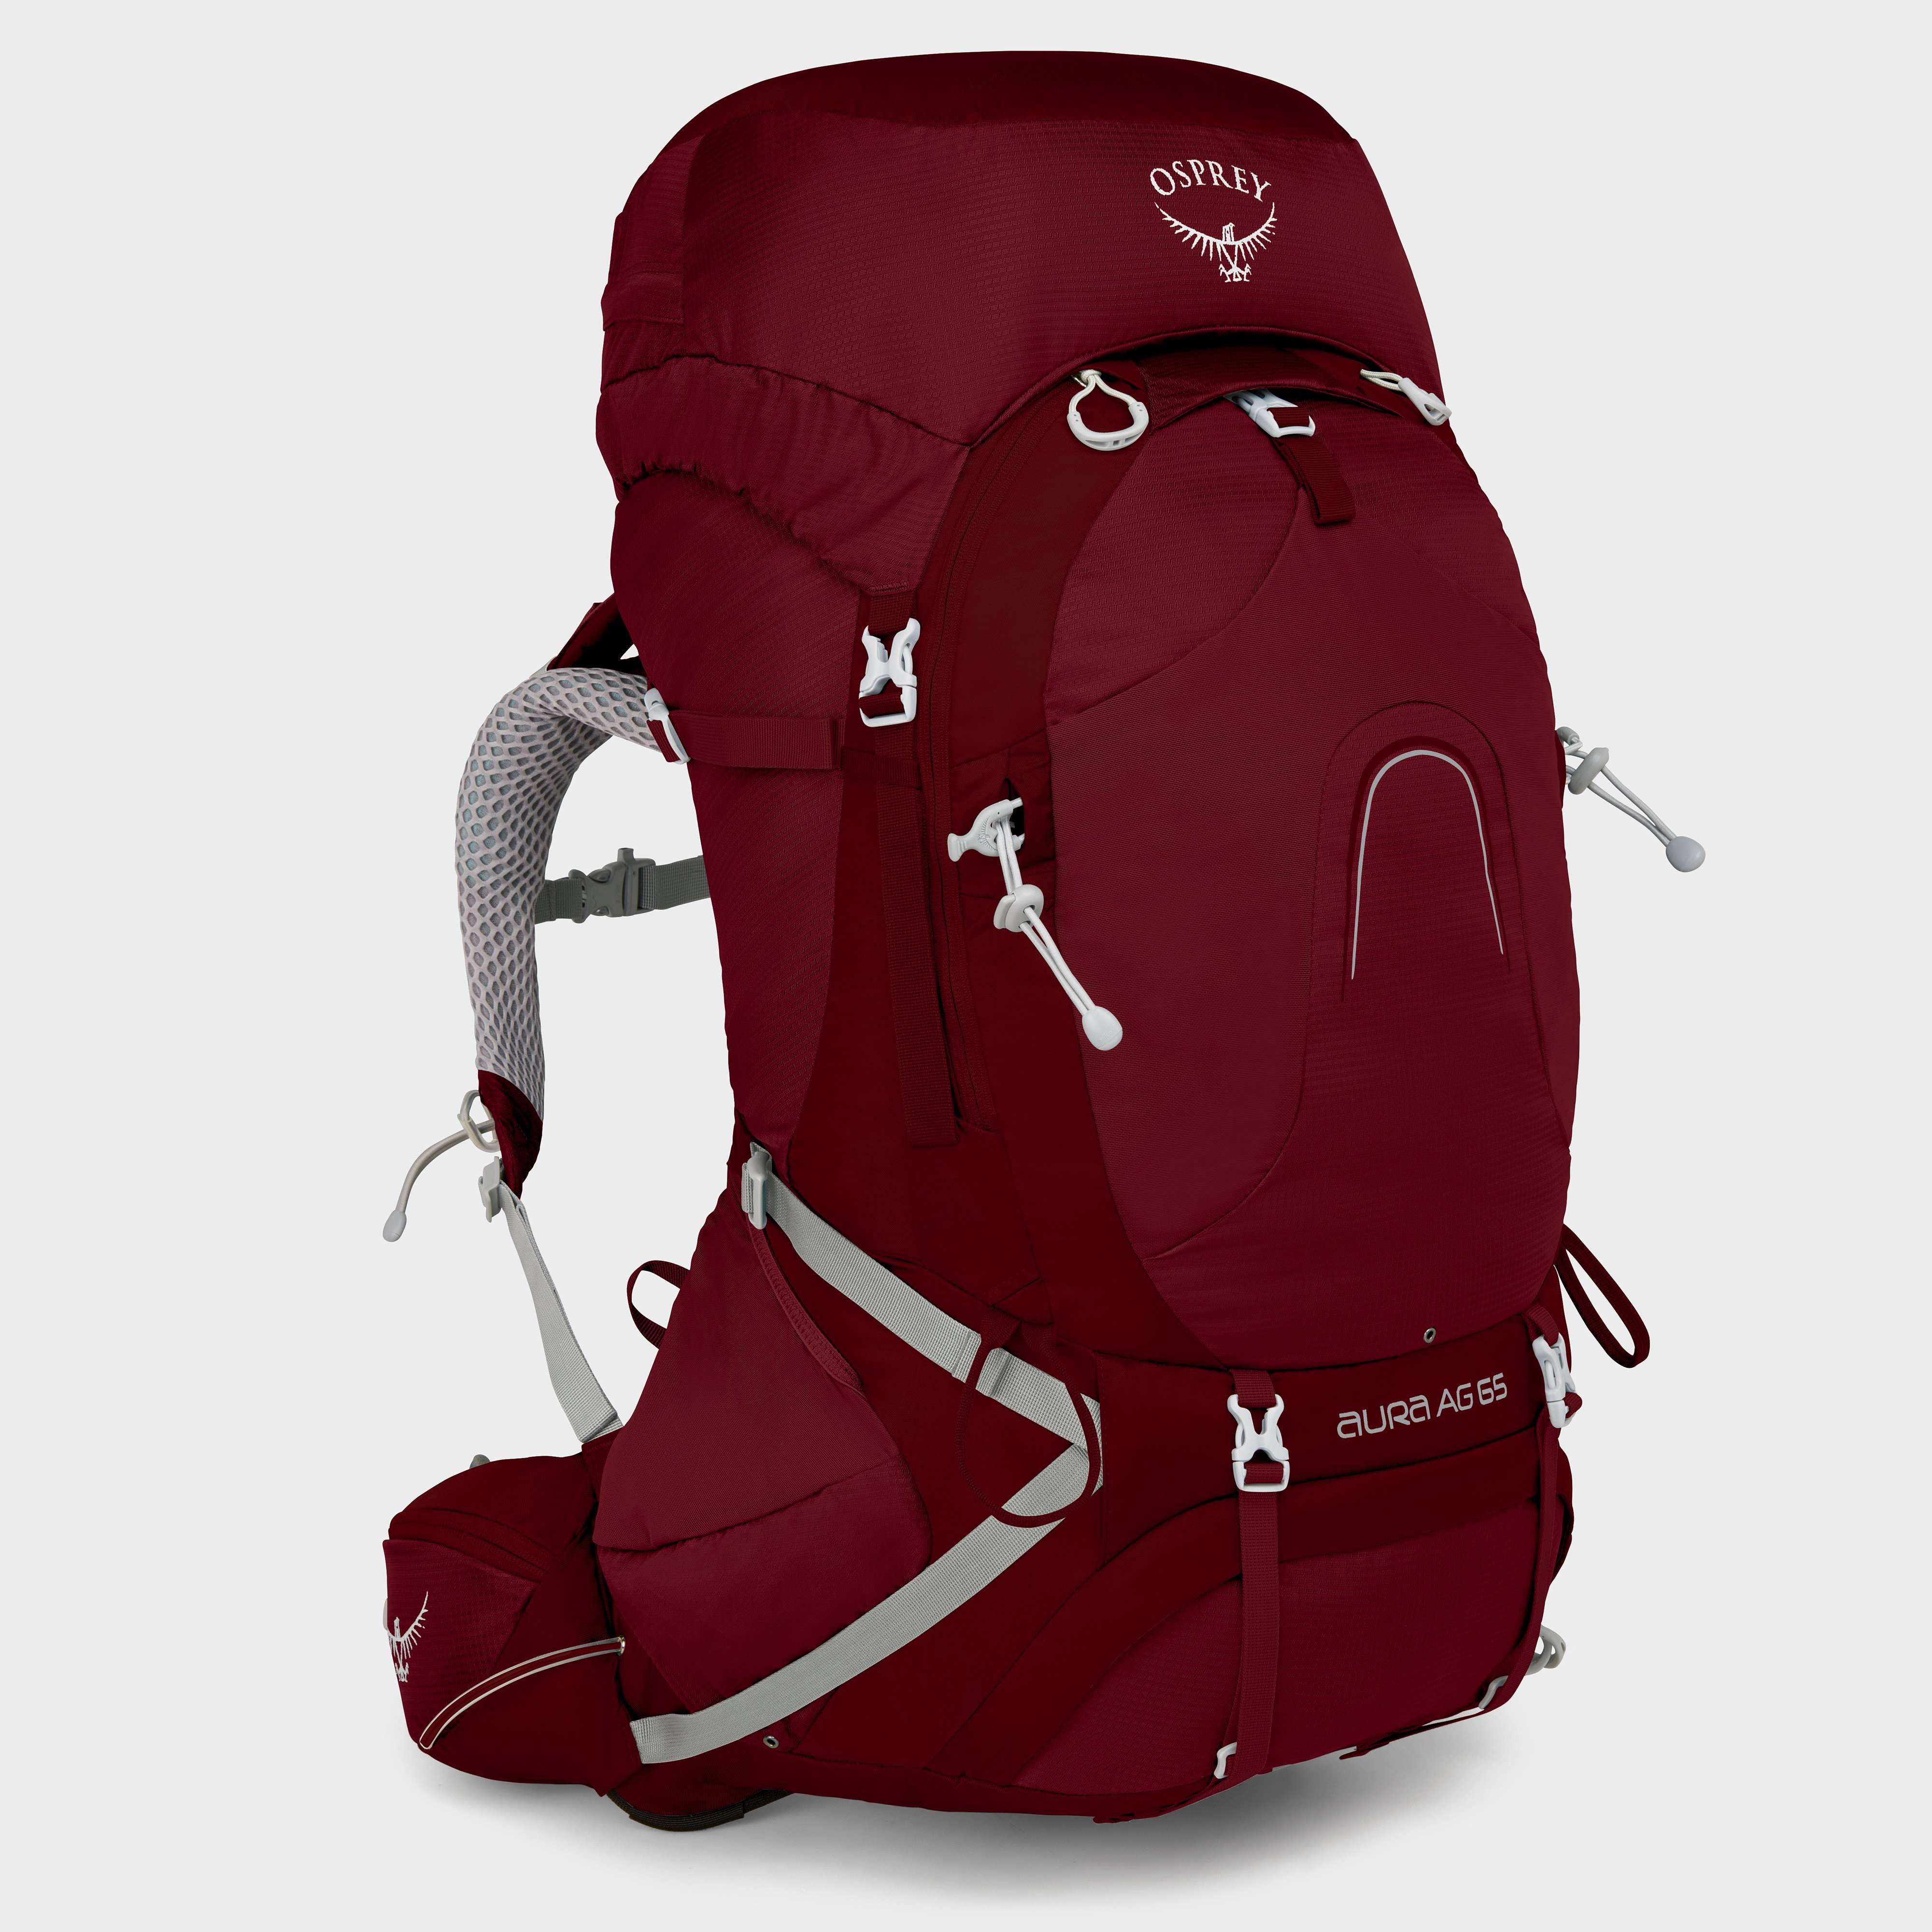 OSPREY Women's Aura AG 65 Backpack (Medium)